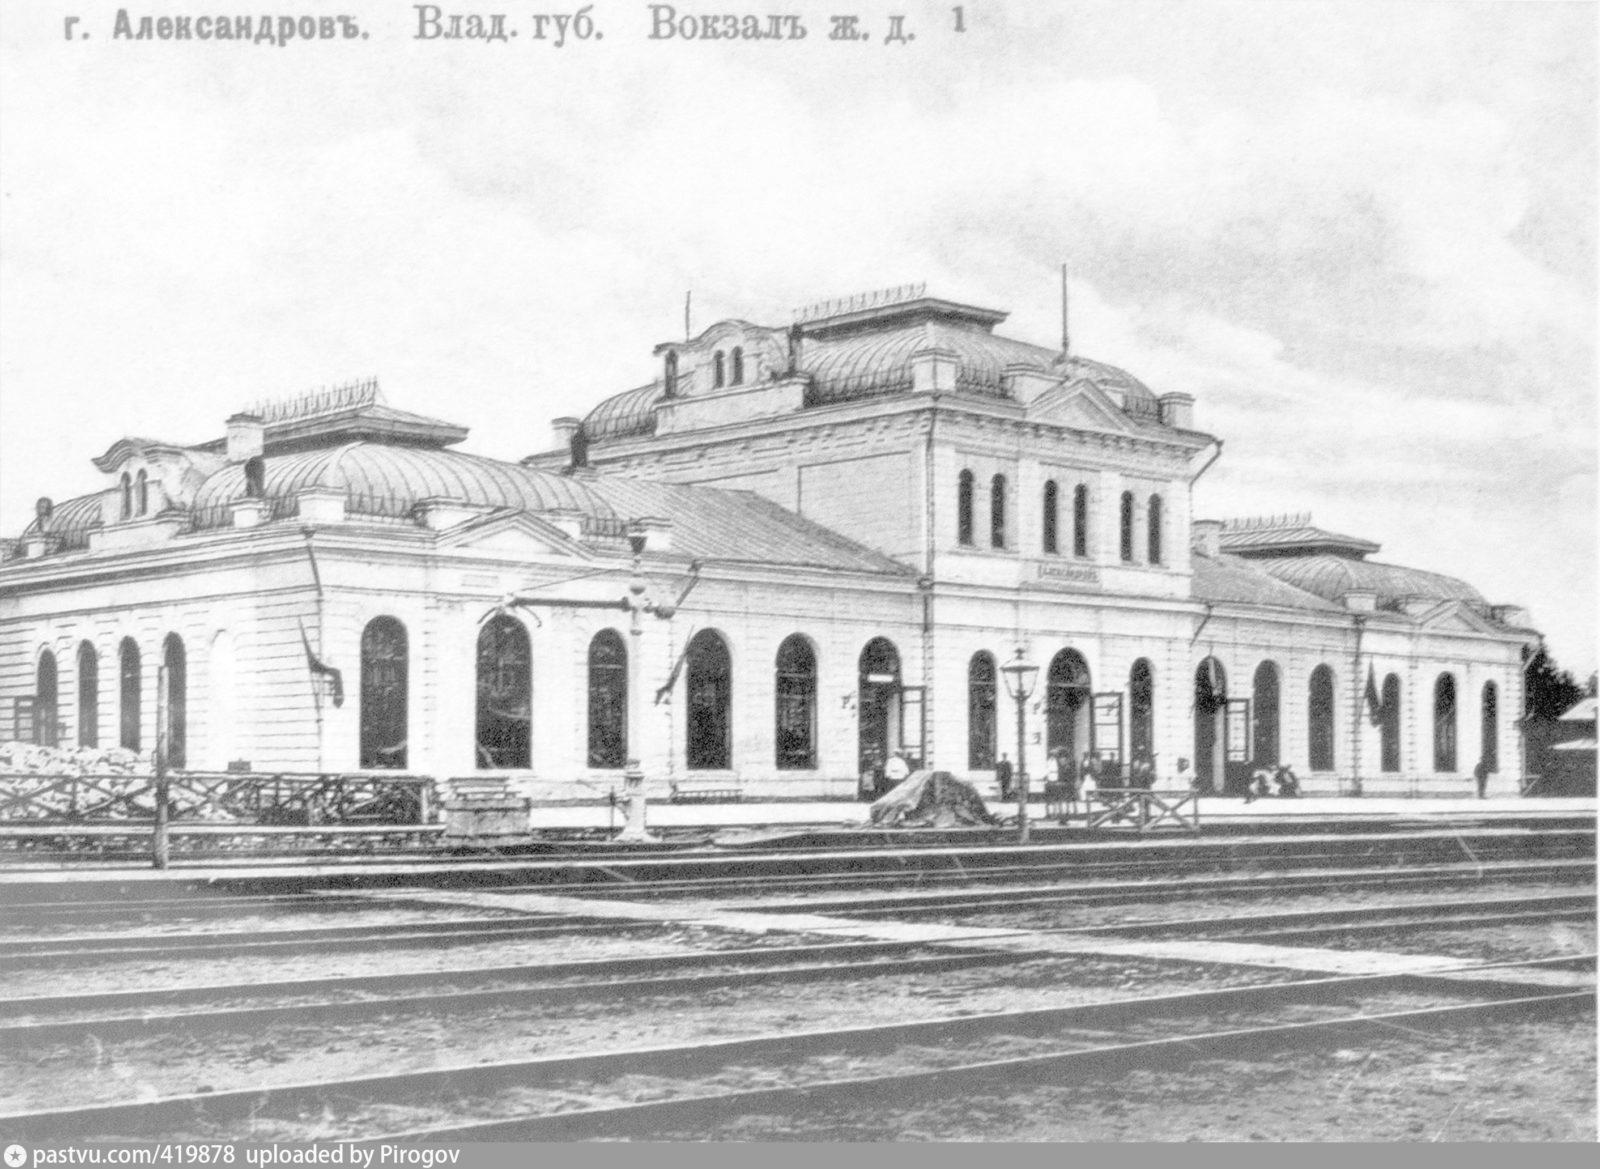 Alexandrov Railway Station